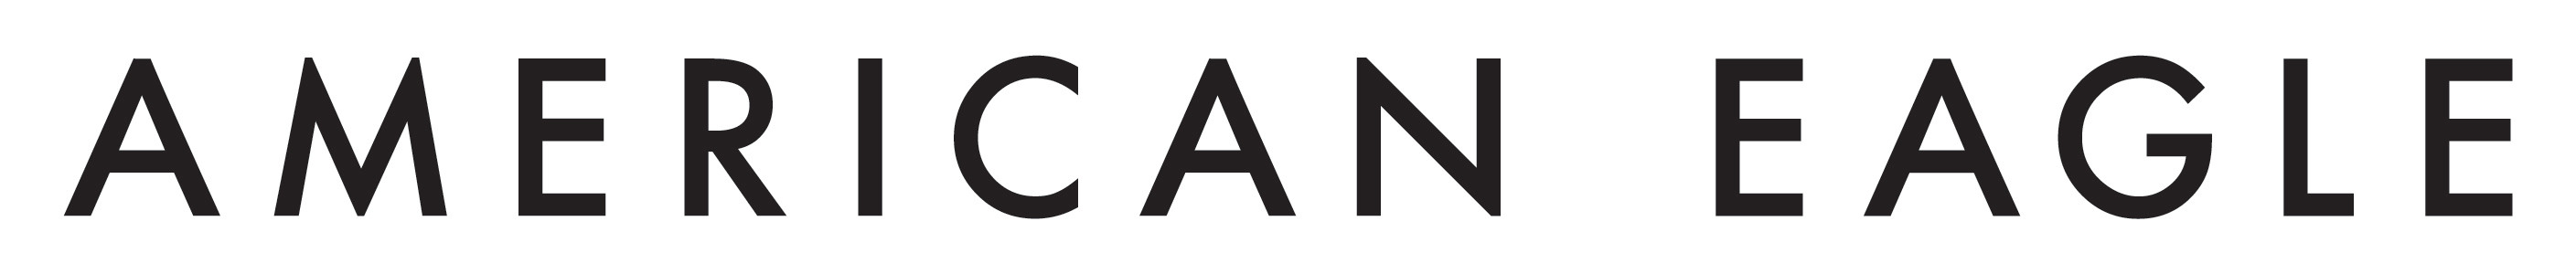 AMERICAN-EAGLE-type-logo-01-JPG.jpg